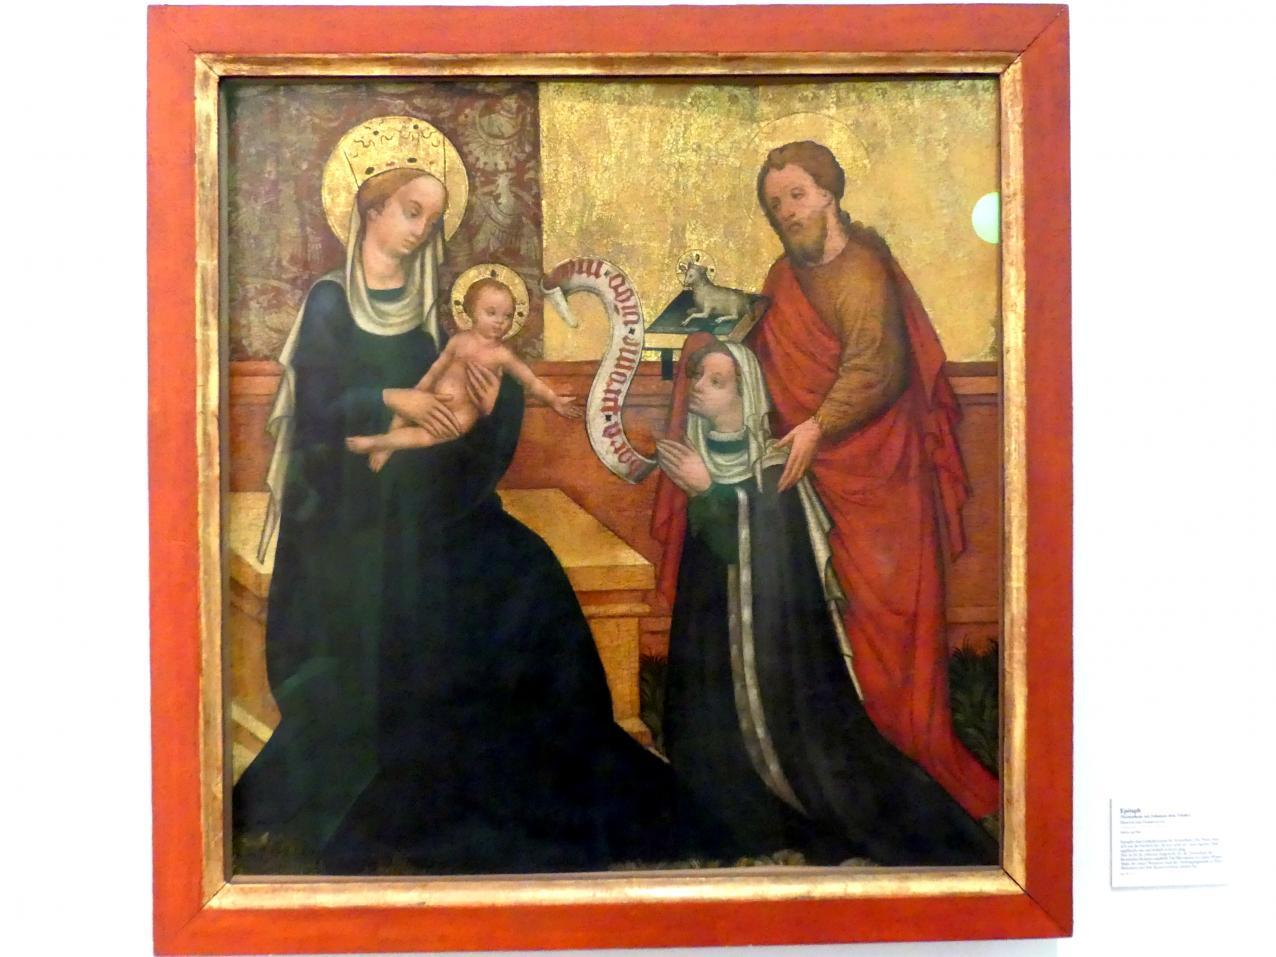 Meister der Darbringung: Epitaph, um 1420 - 1440